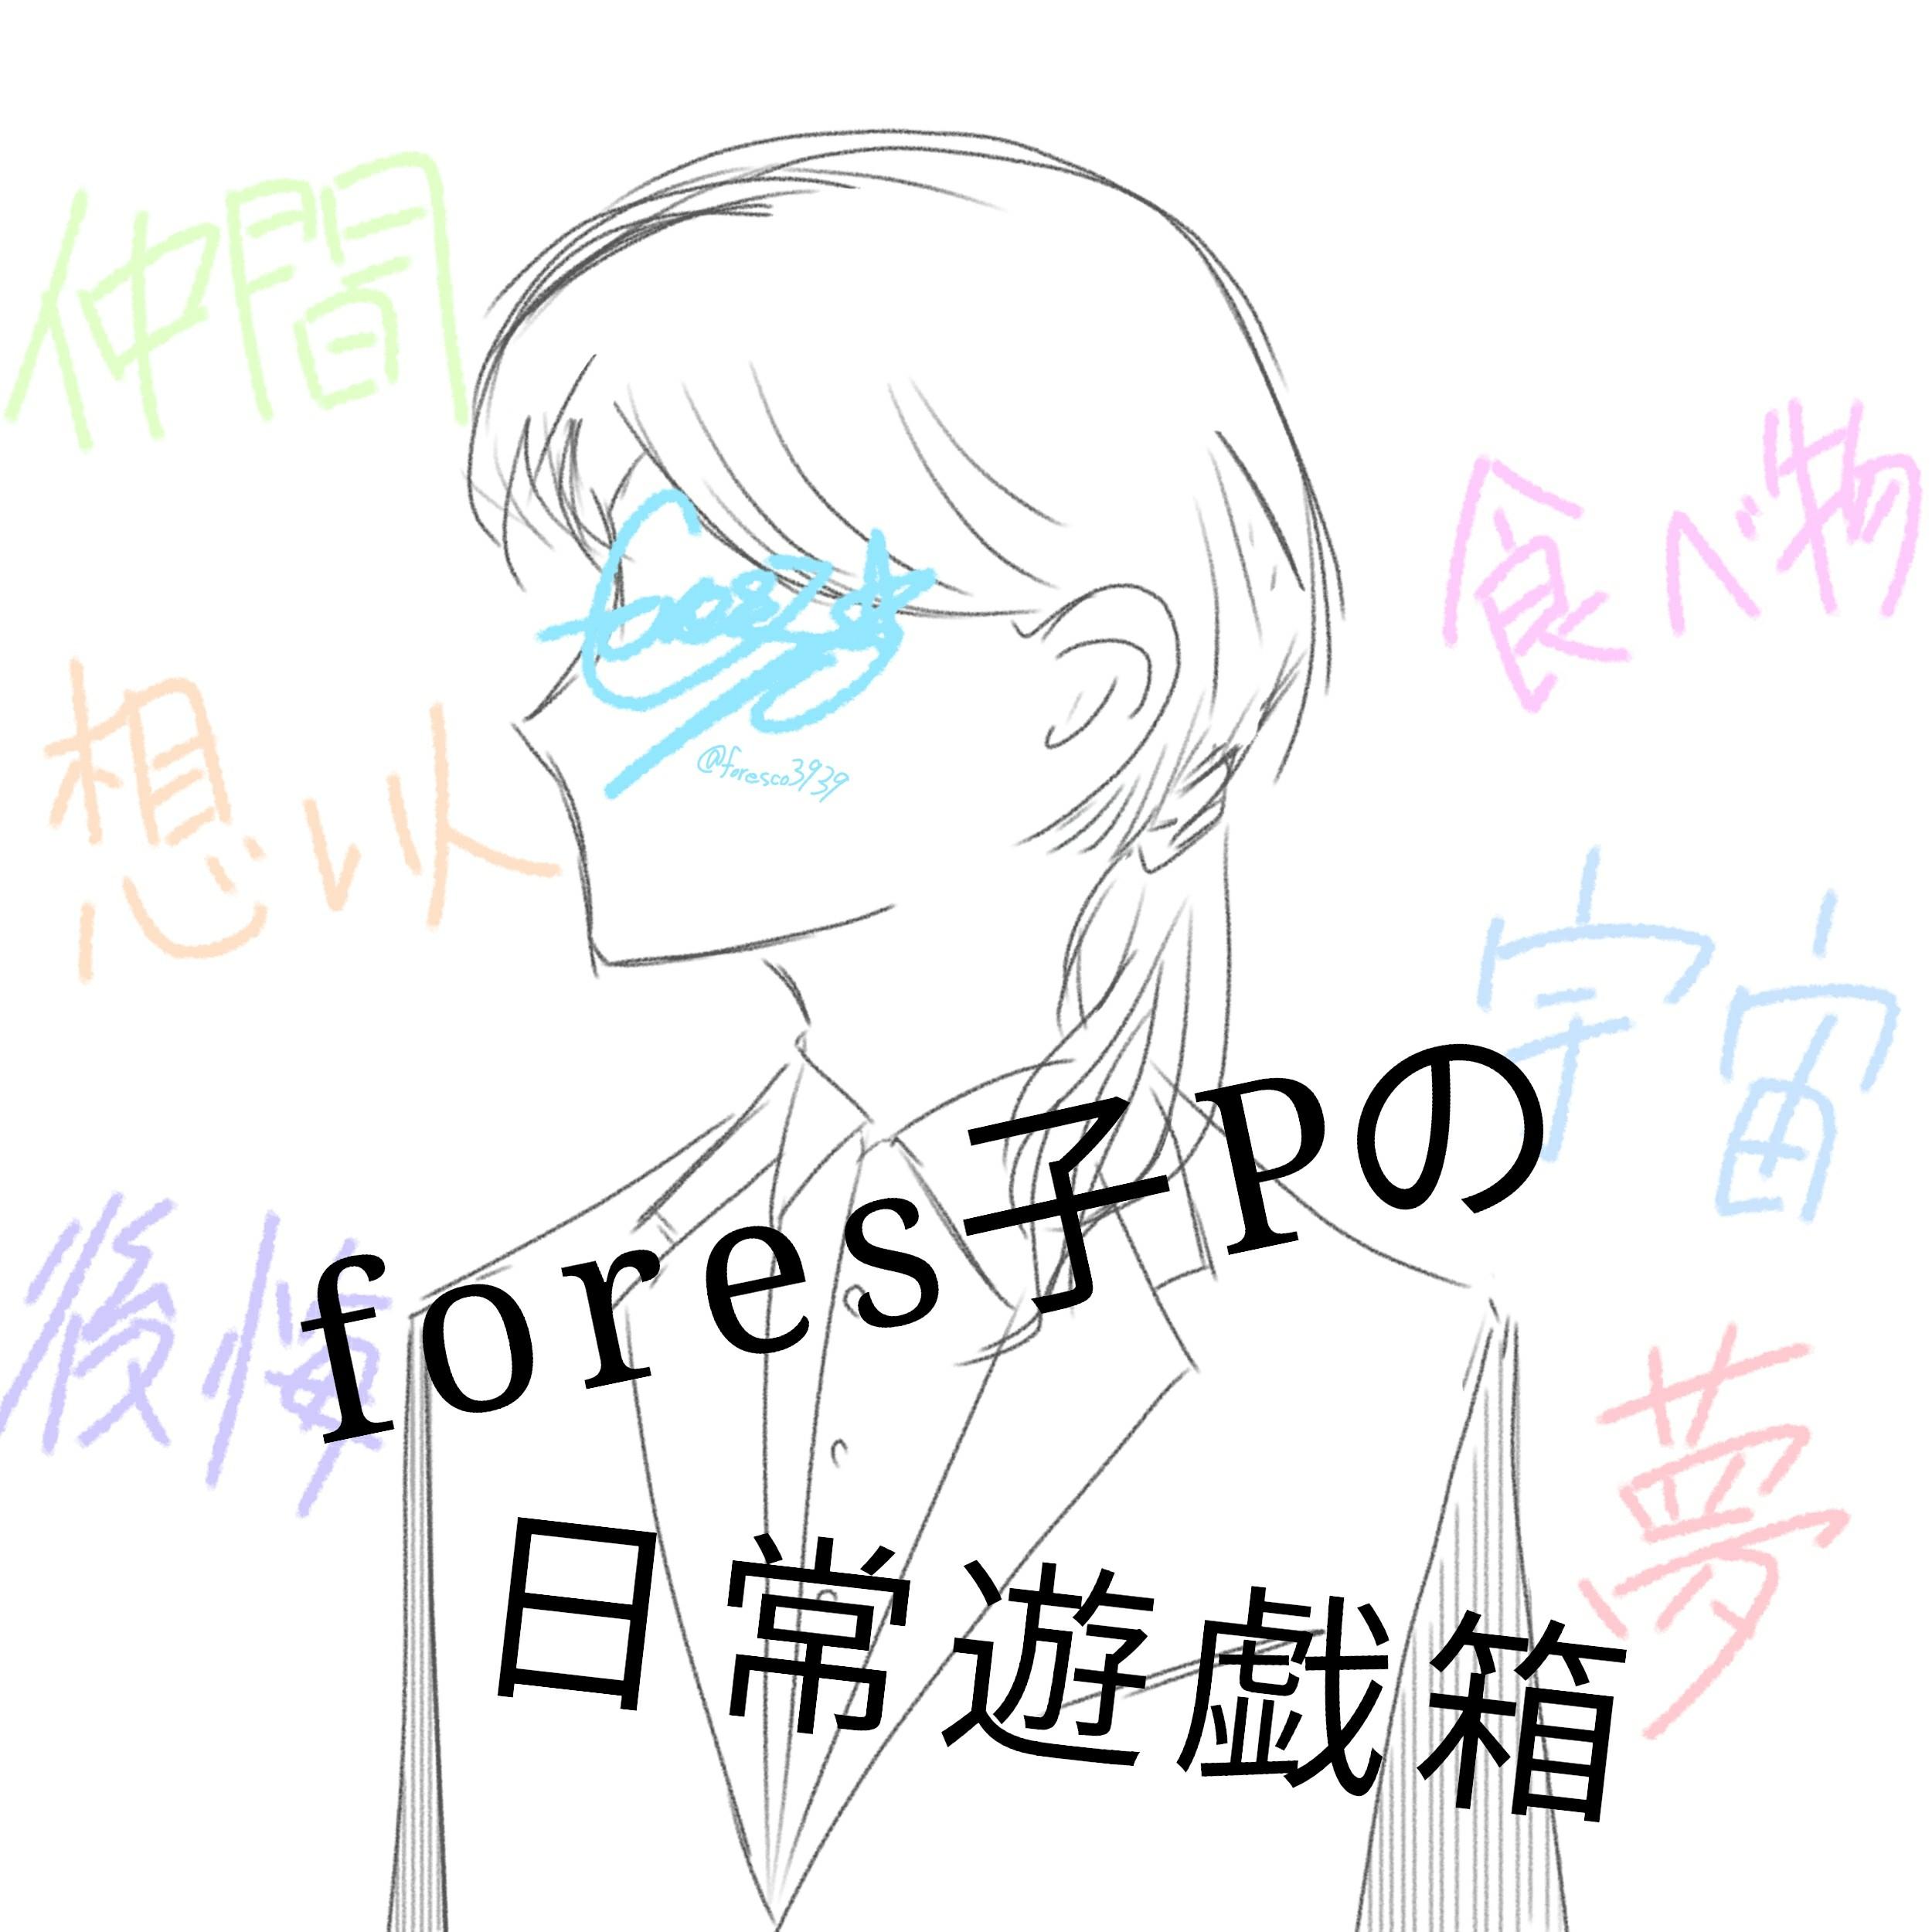 f:id:forescoP:20170411233243j:image